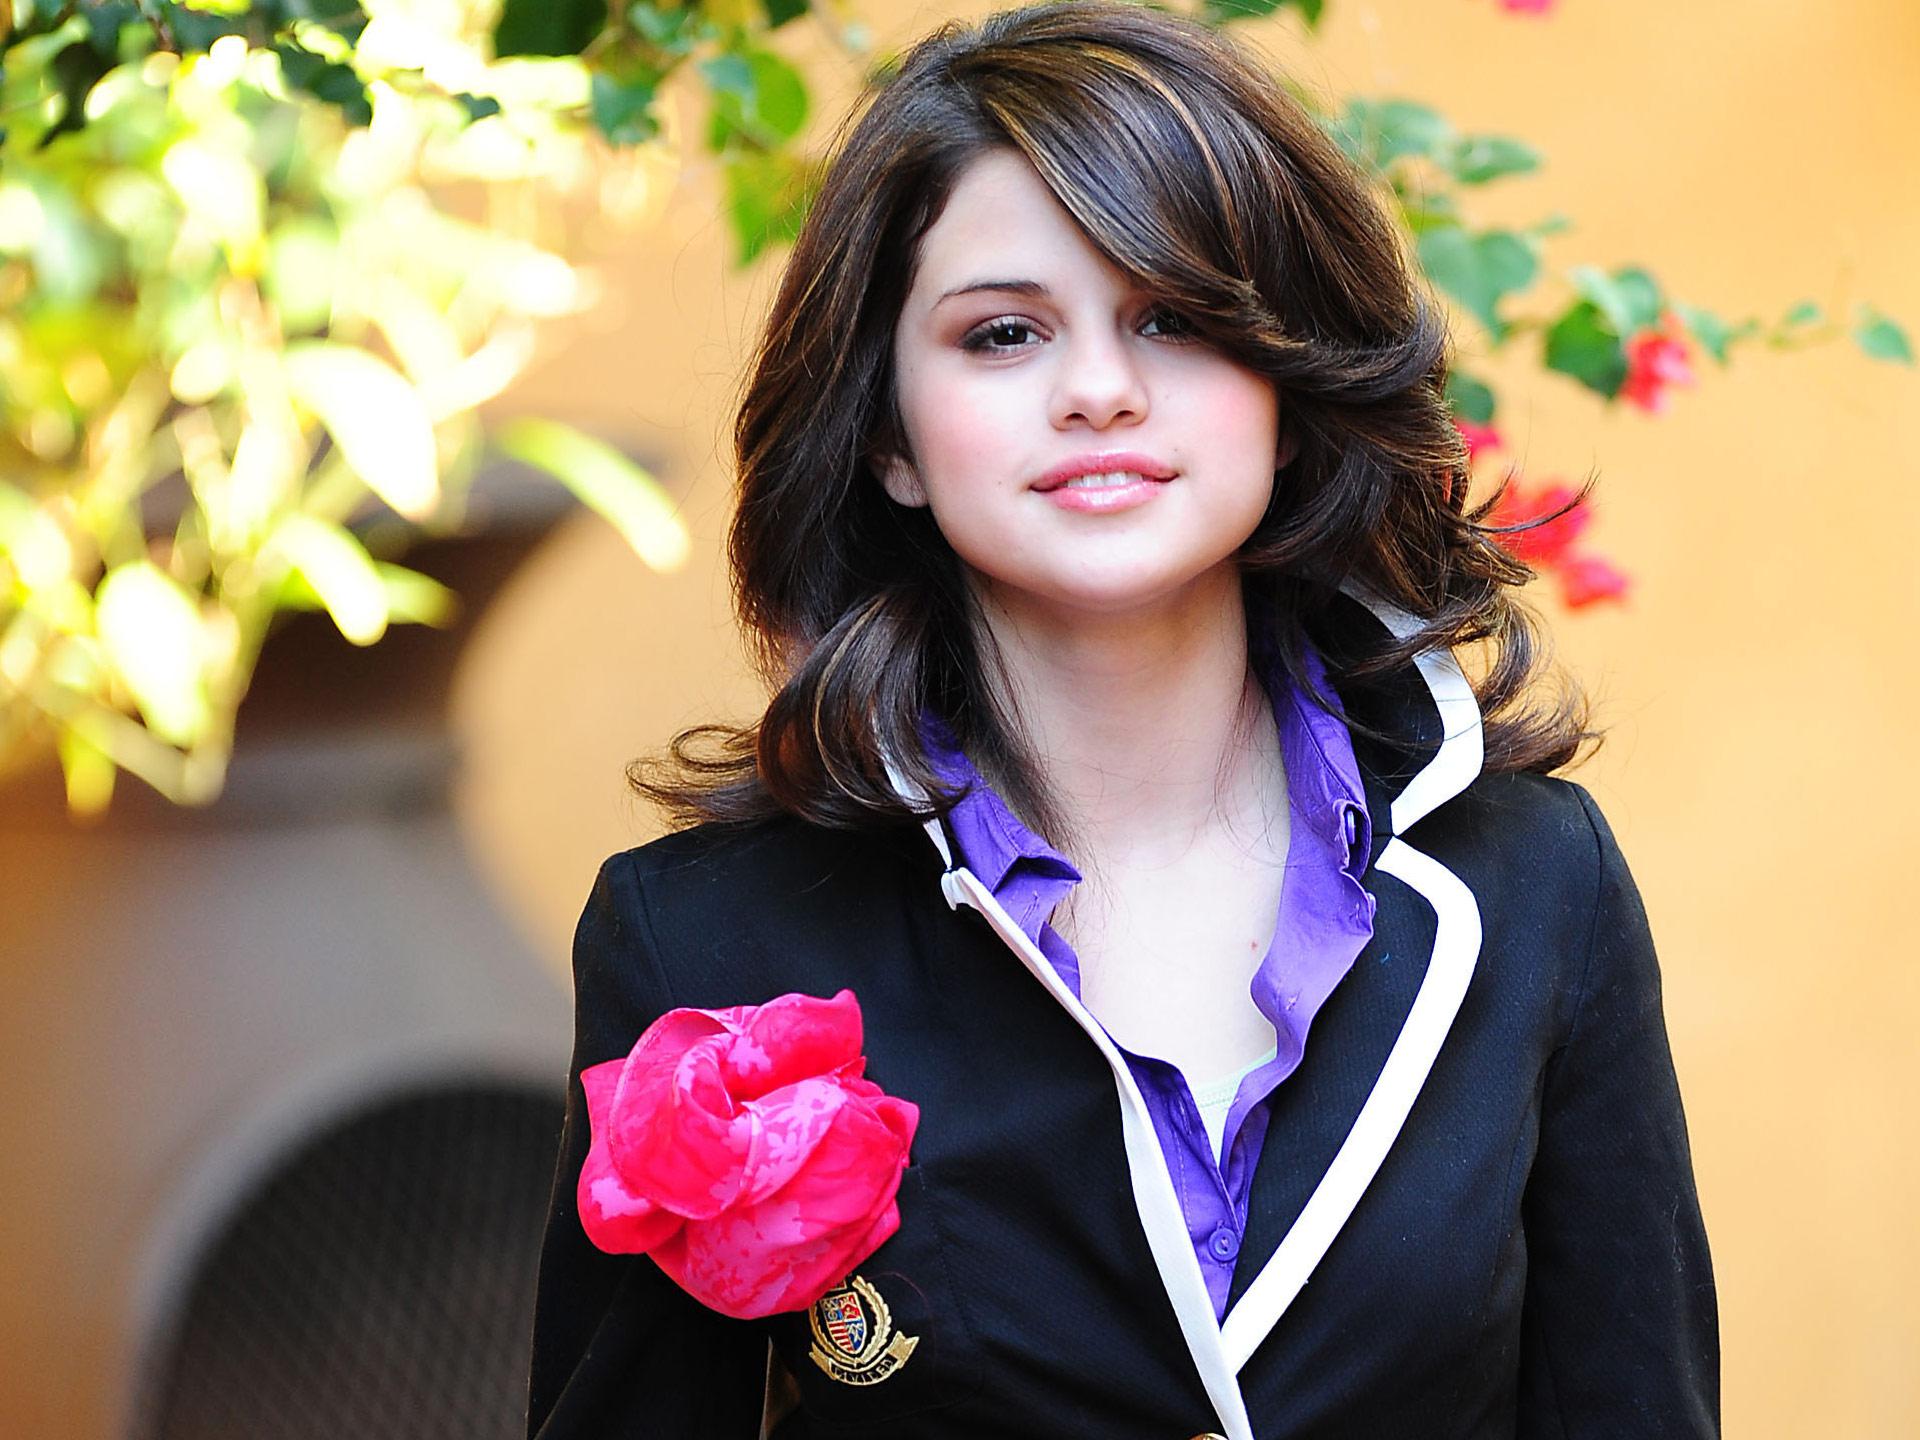 HD Wallpapers Selena Gomez 18